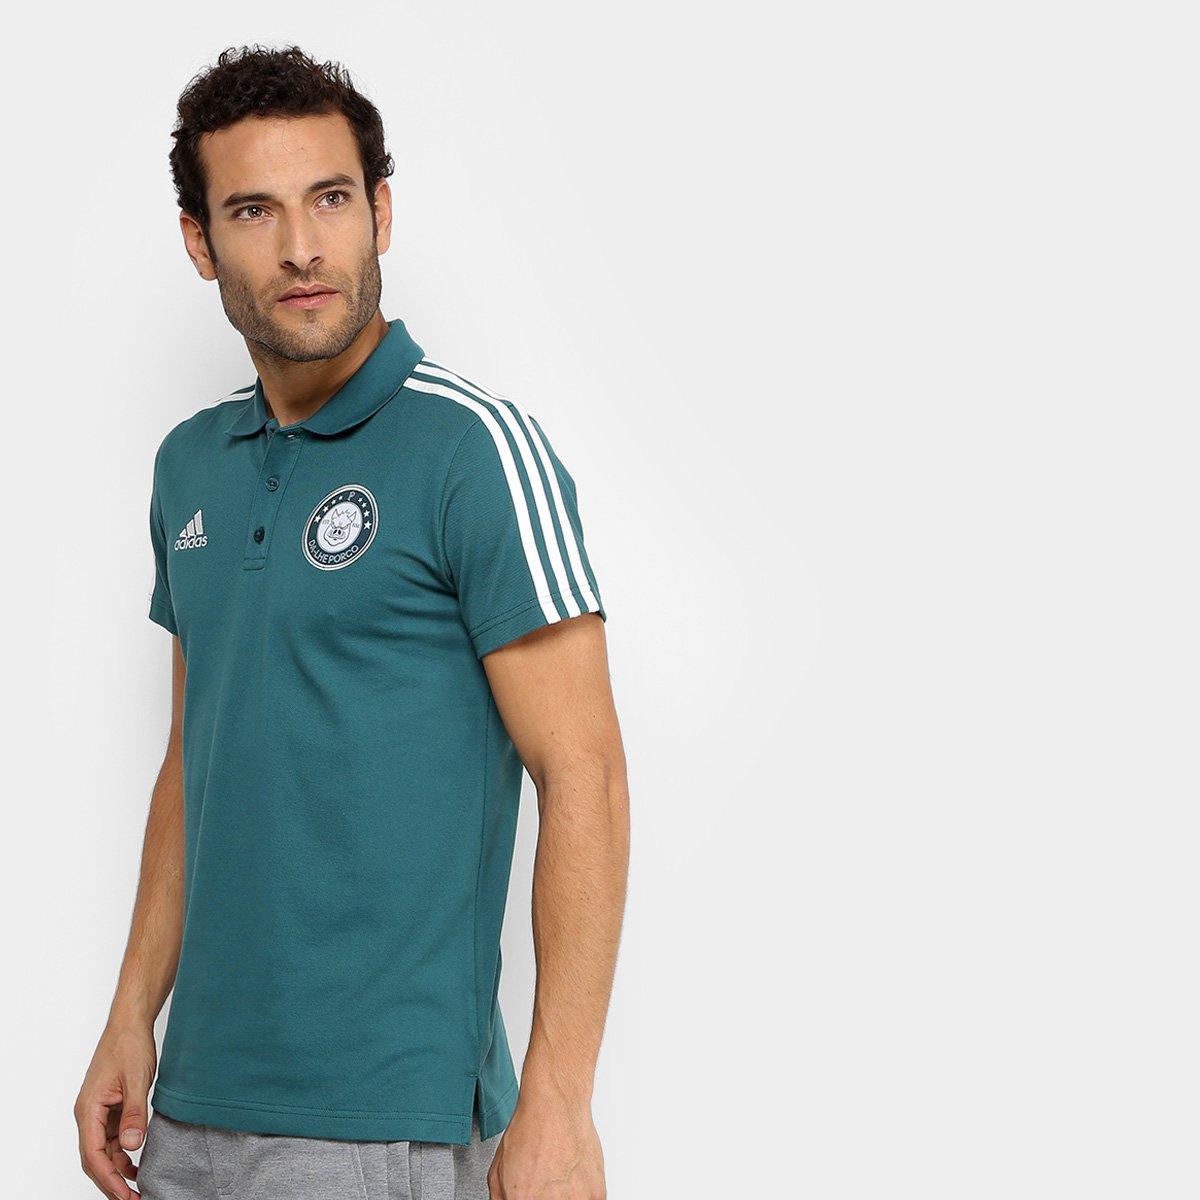 Camisa Polo Palmeiras 3S Adidas Masculina 72aab79206daa